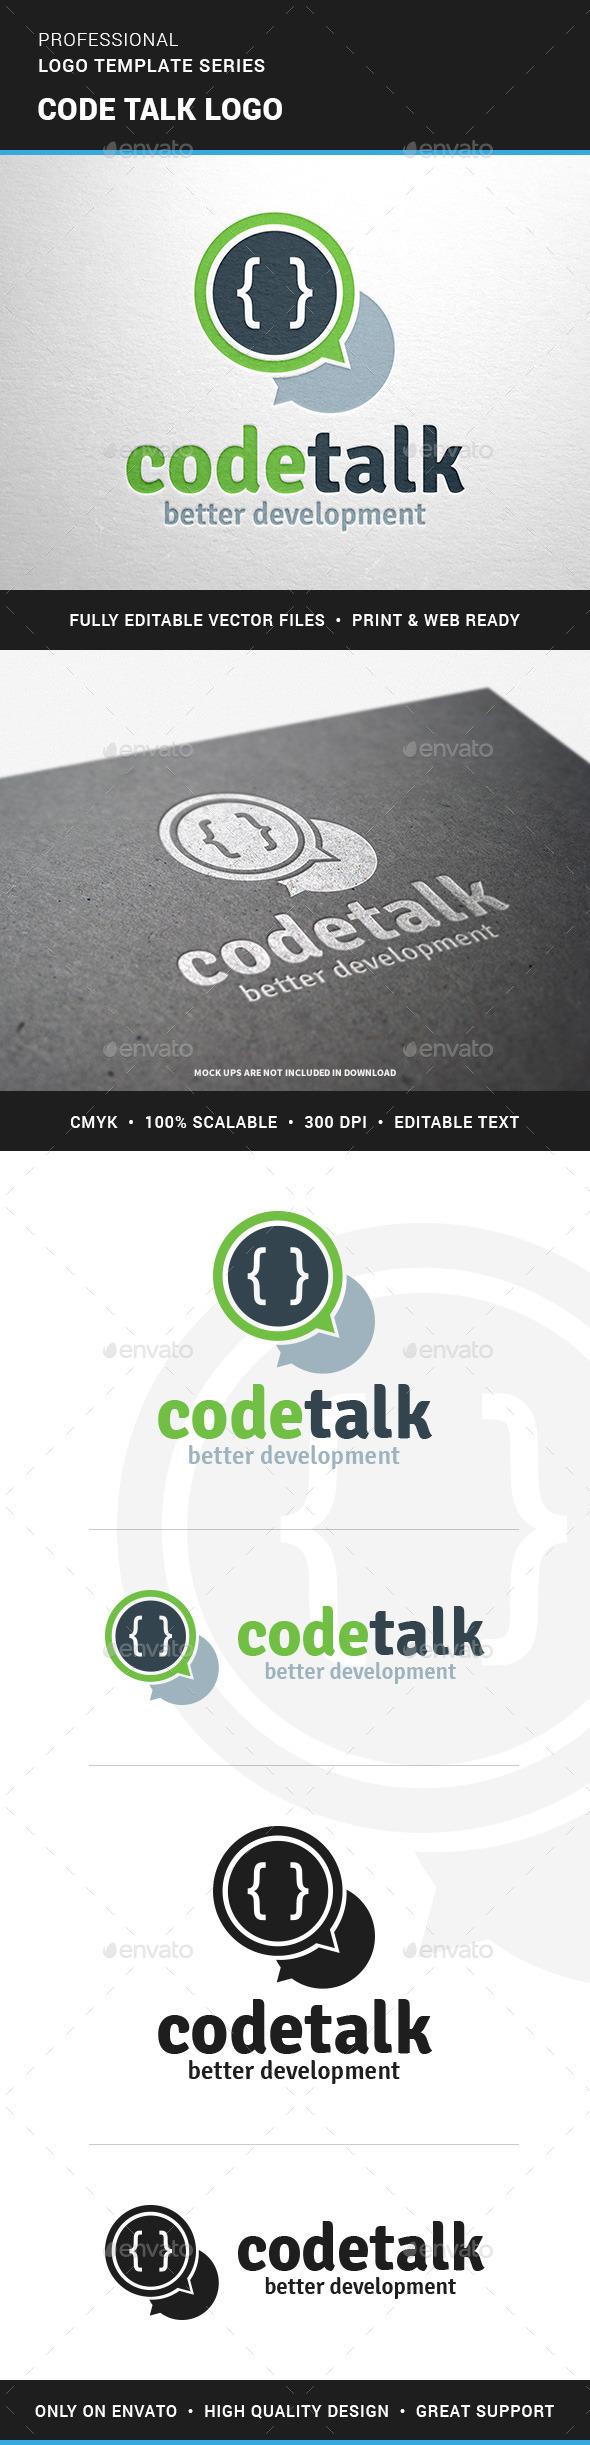 Code Talk Logo Template